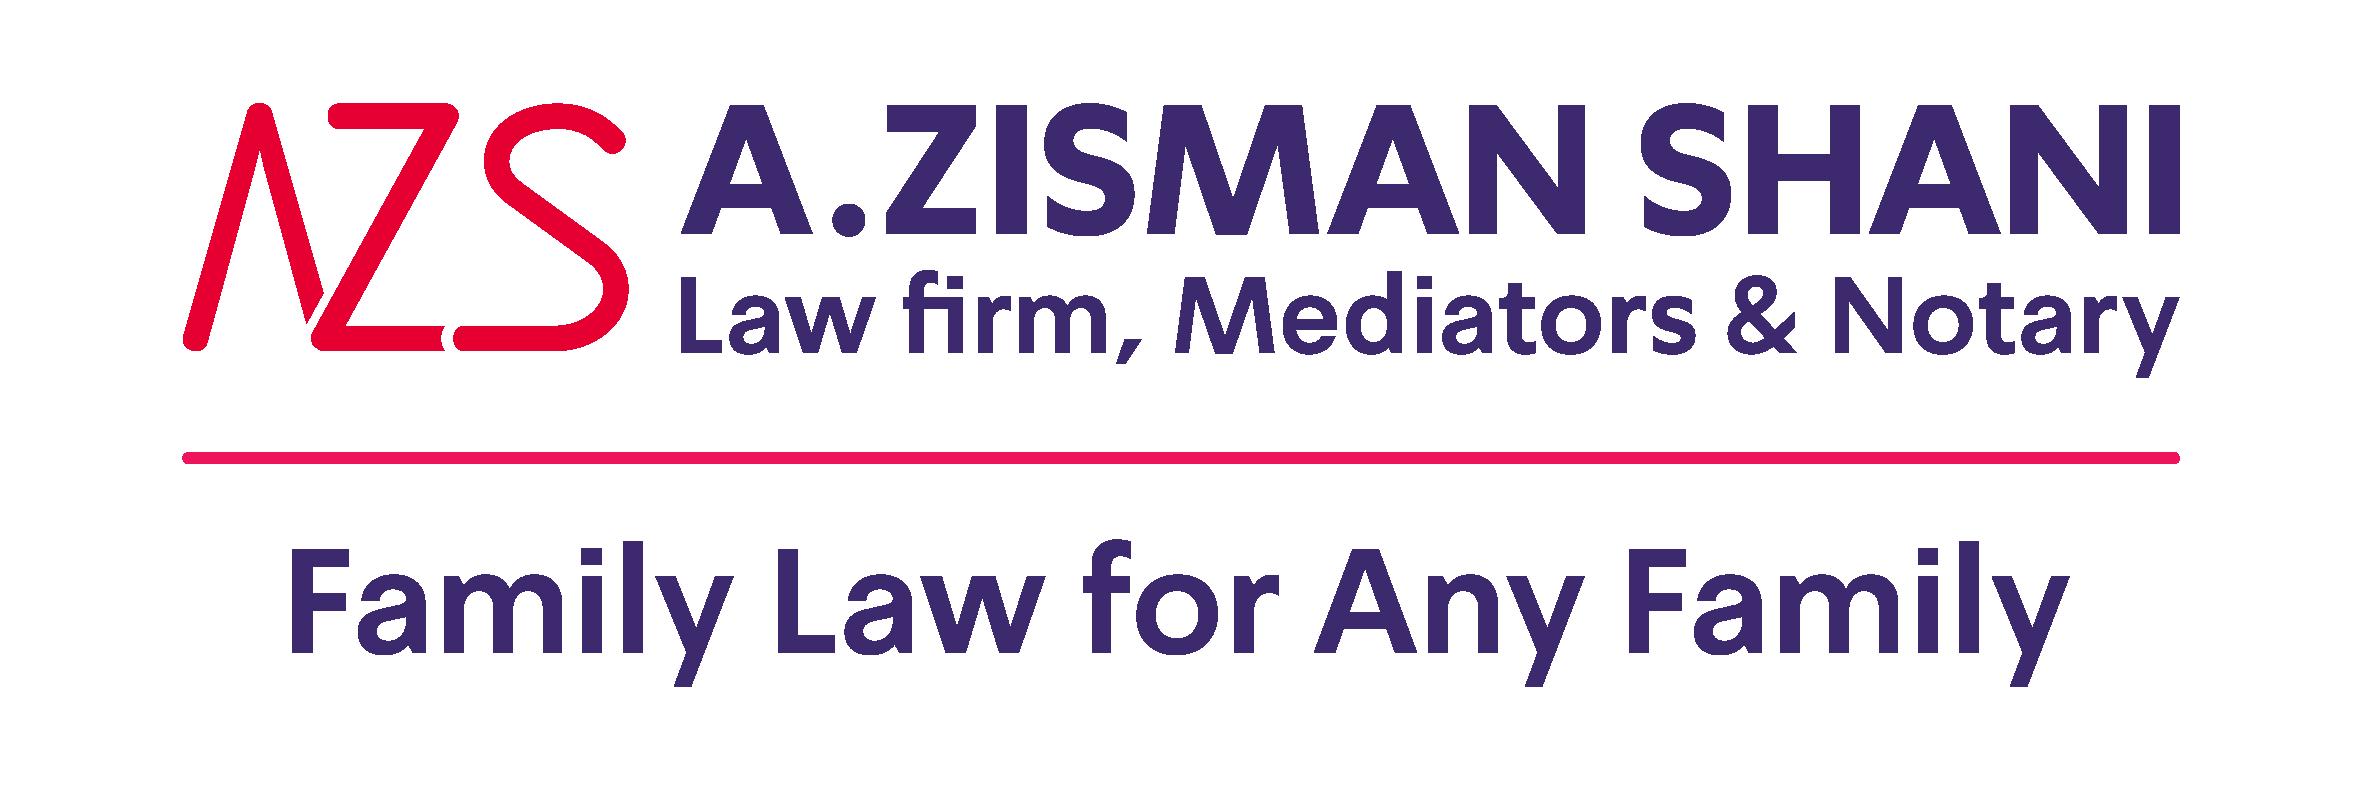 A. Zisman Shani - Law Firm, Mediators & Notary